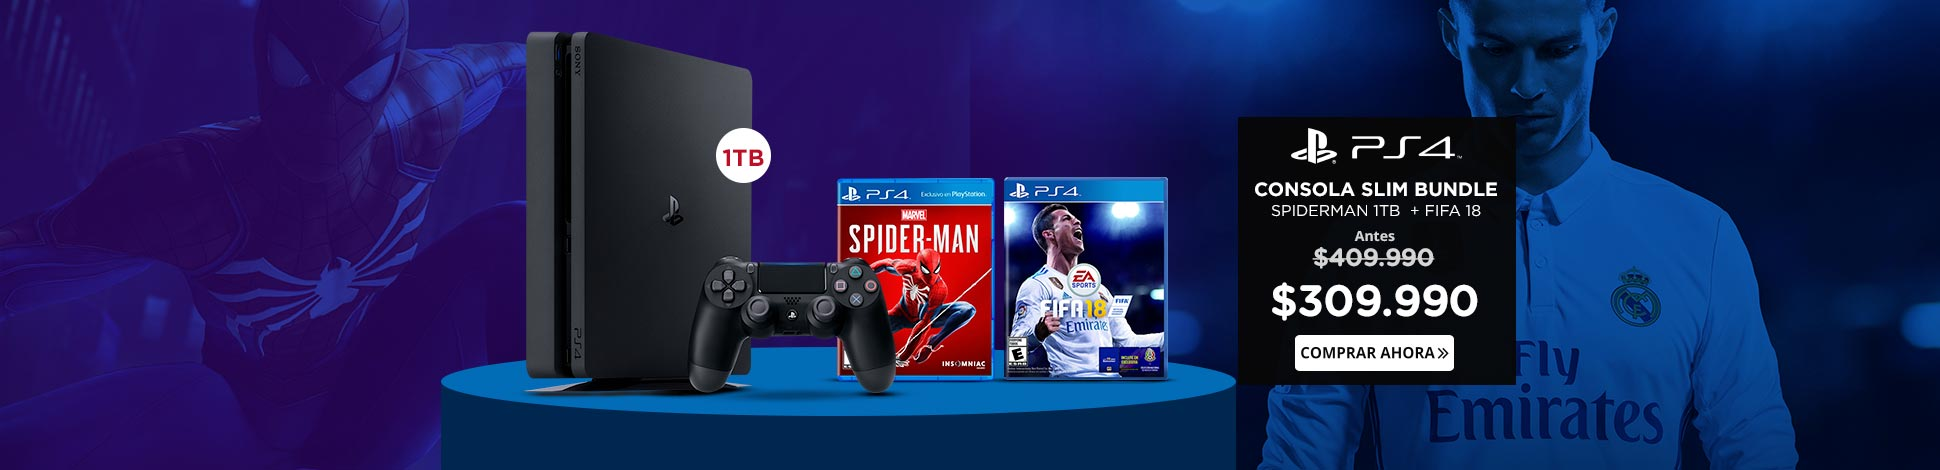 HS-PS4-Spiderman.jpg